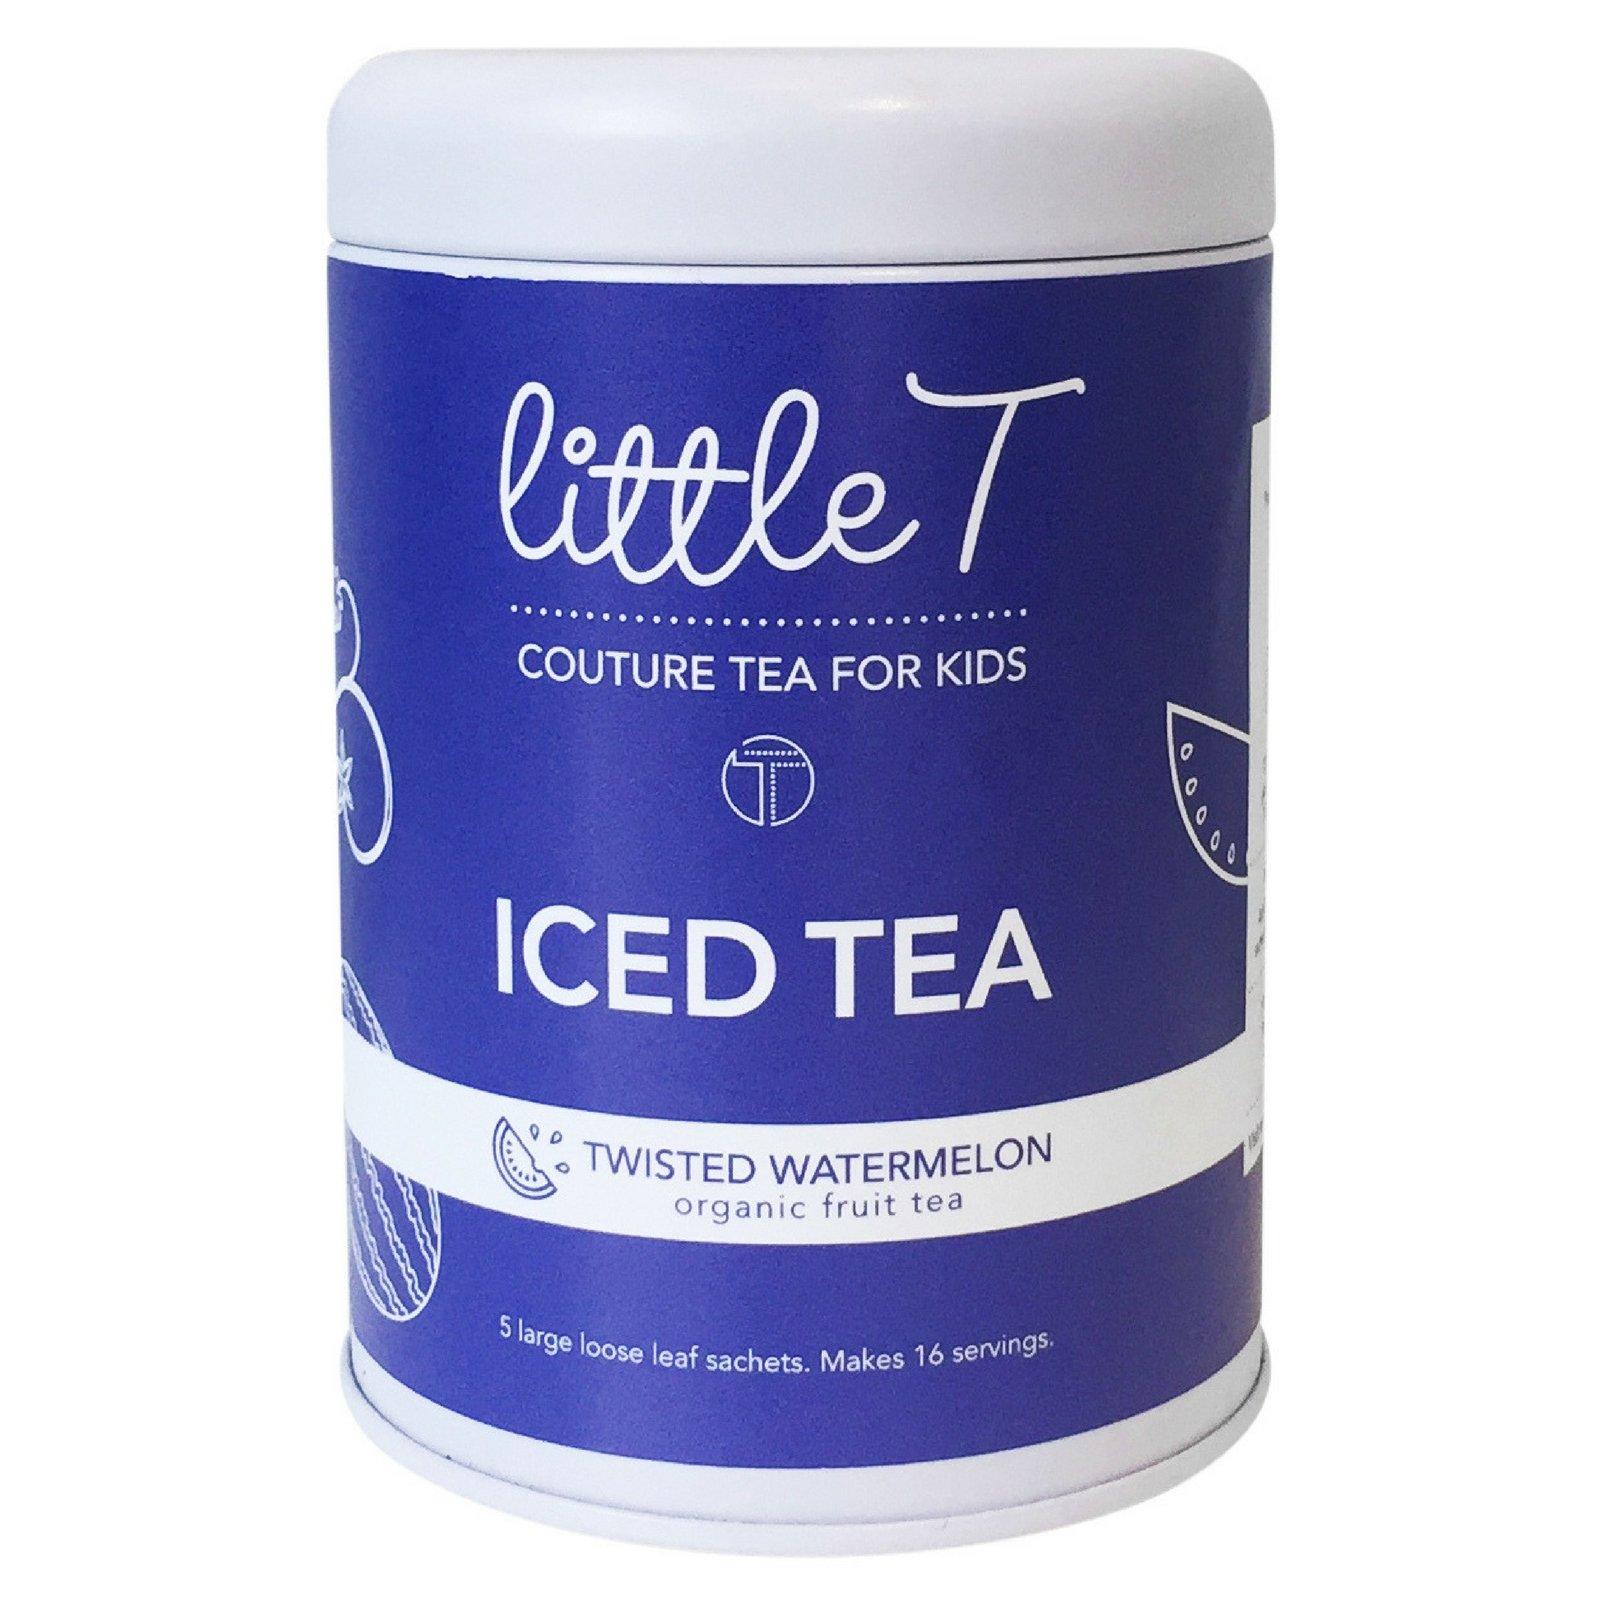 LITTLE T Twisted Watermelon Organic Fruit Iced Tea for Kids. Sugar-free, Caffeine-free, Antioxidant-rich Herbal Iced Tea Sachets (Iced Tea Tin [makes 16 servings])